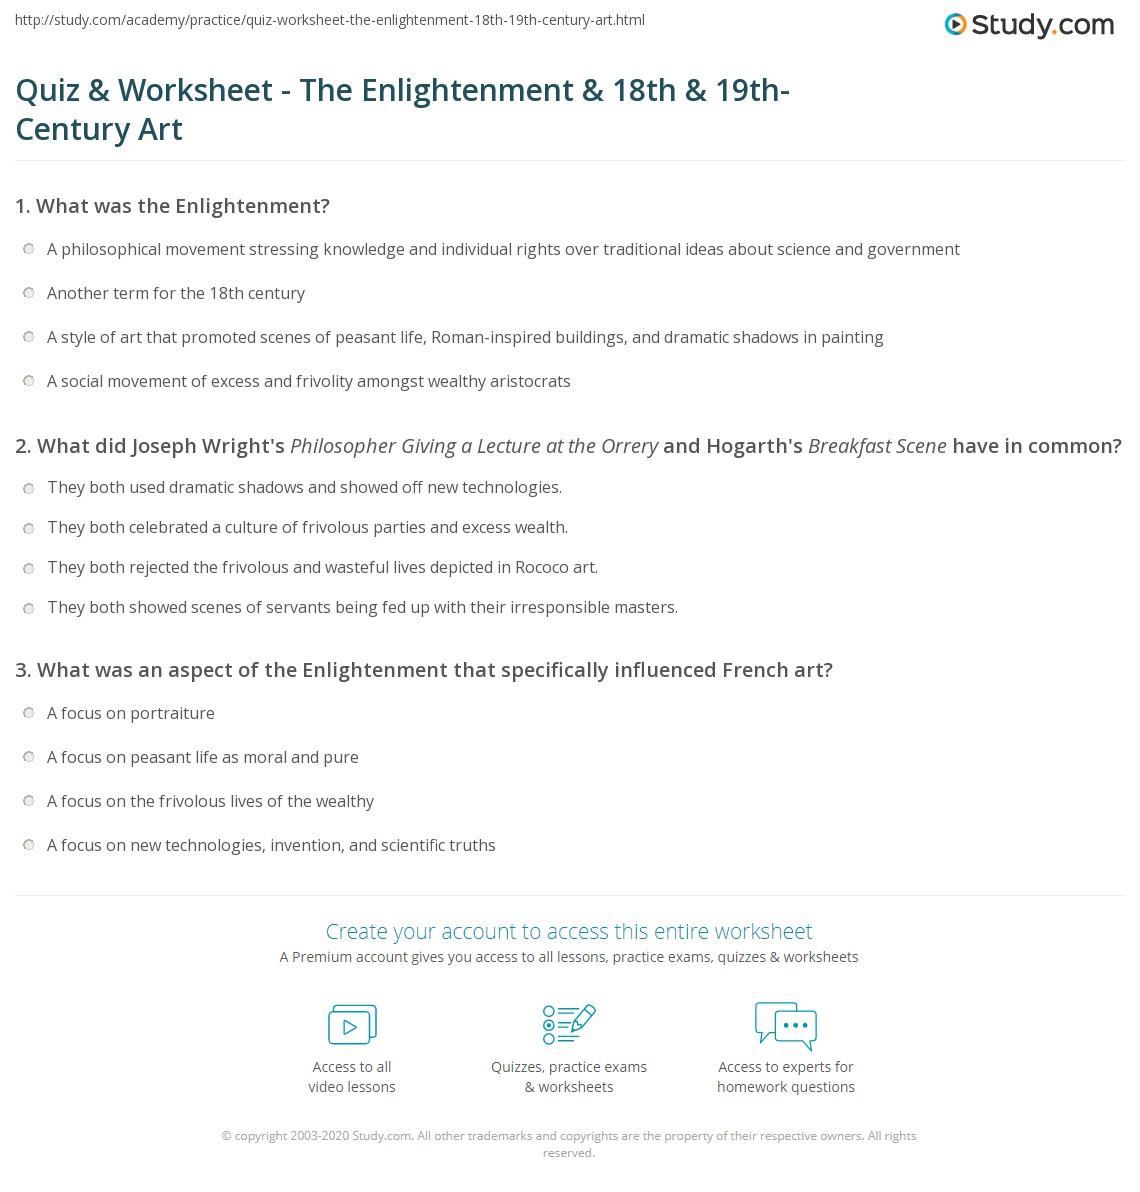 Quiz Worksheet The Enlightenment 18th 19th Century Art